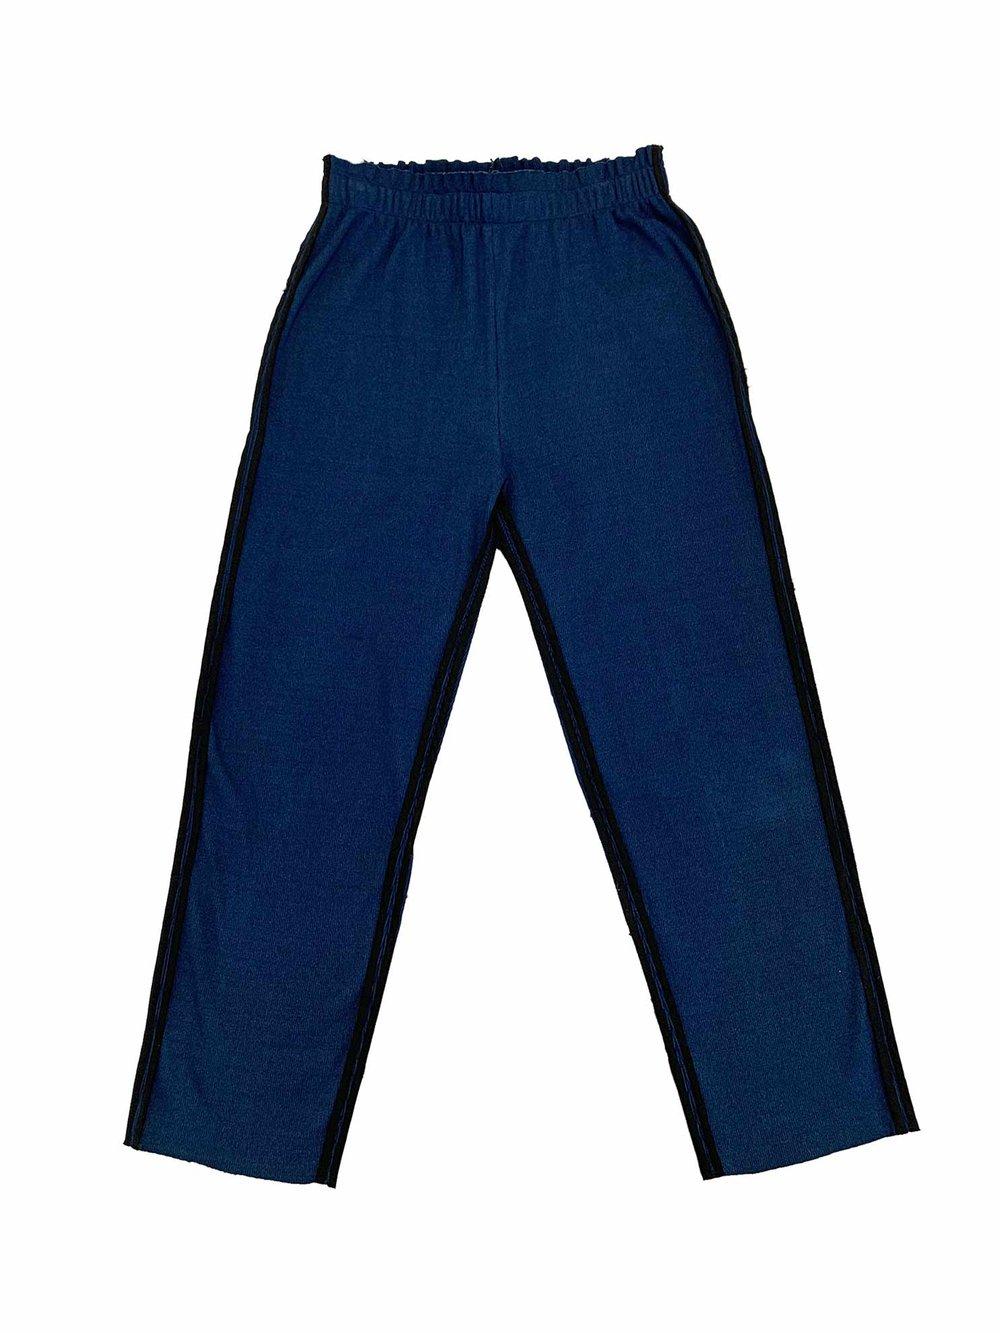 Image of OF1 Trousers - Indigo